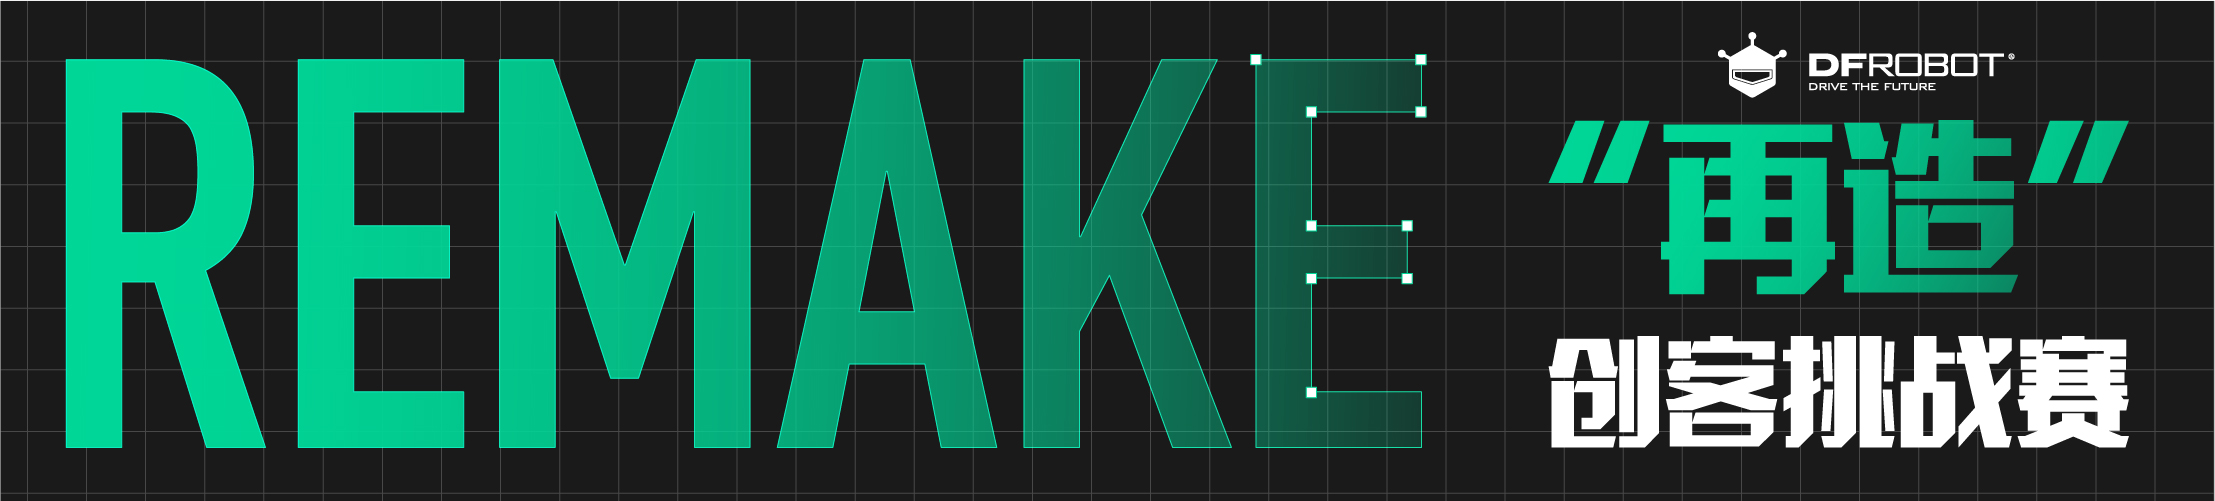 makelog最新创客大赛活动推荐,创客大赛题目:#REMAKE再造#创客挑战赛